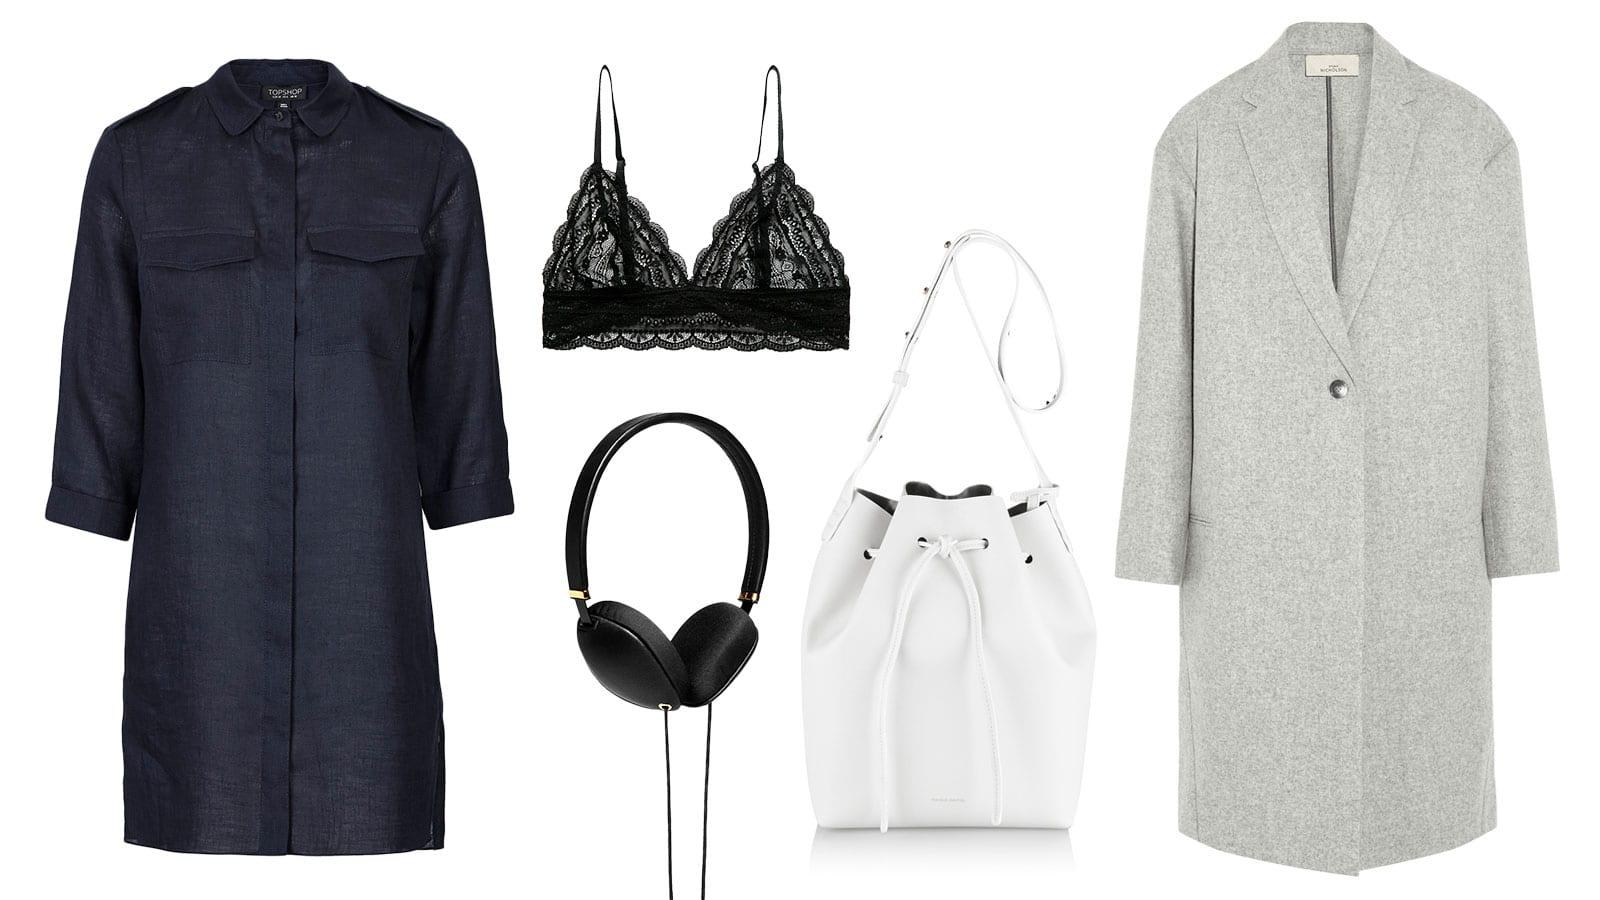 Shopping List | Indigo & Lace | 1. Mango - Lace Triangle Bra || 2. Topshop - Utility Linen Shirt Dress || 3. Studio Nicholson - Broadway Coat || 4. Mansur Gavriel - White Leather Bucket Bag || 5. Molami - Plica Black Headphones || 6. Topshop - France Silver Lace-Up Shoes